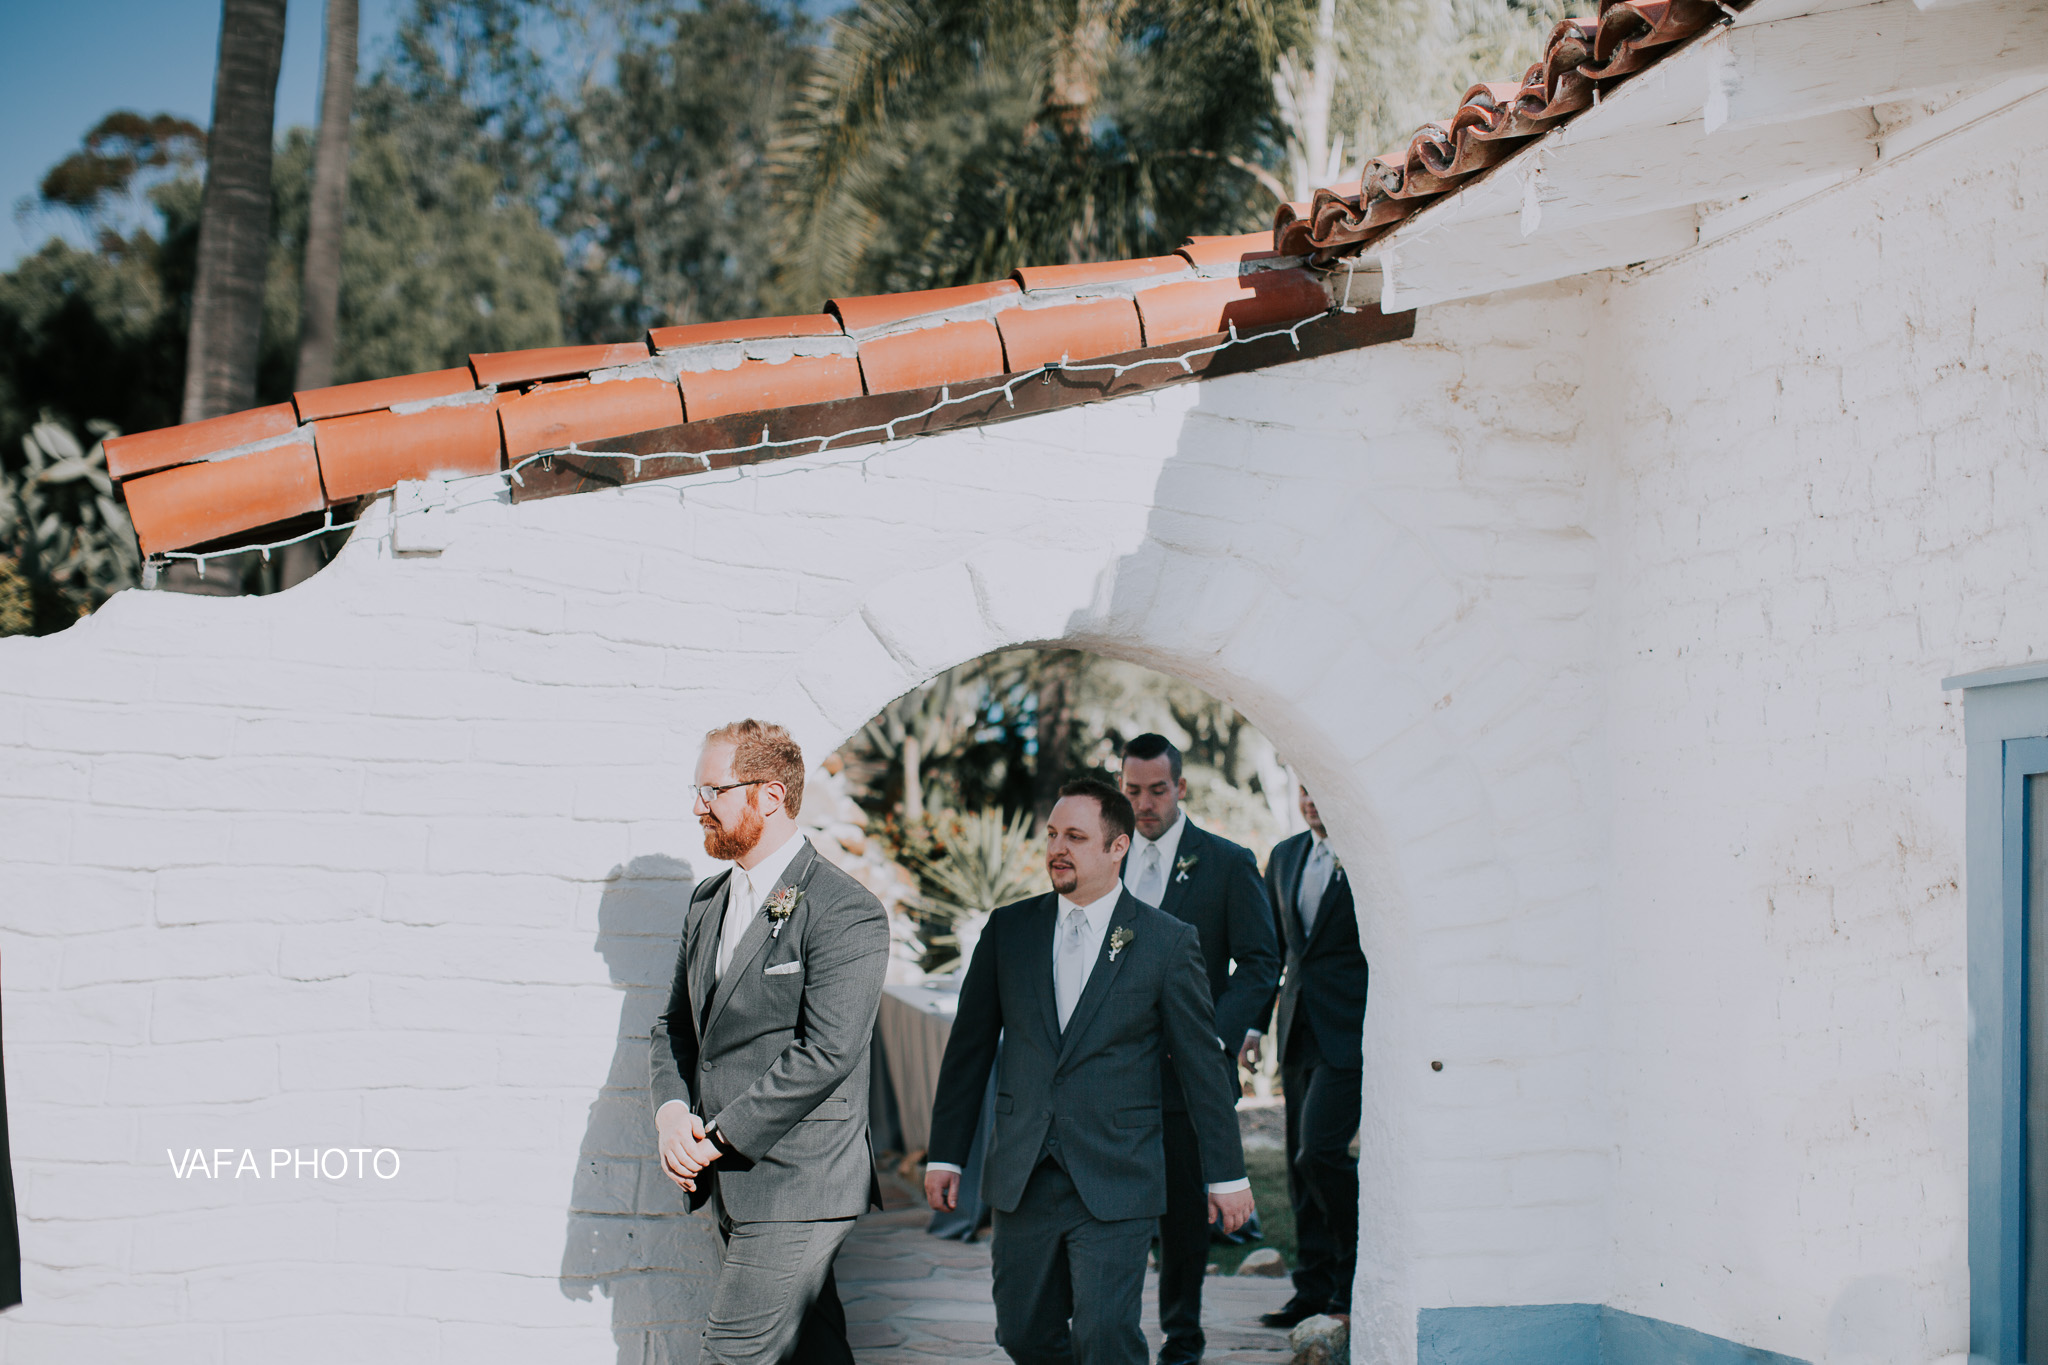 Leo-Carrillo-Ranch-Wedding-Lauren-Mike-Vafa-Photo-525.jpg